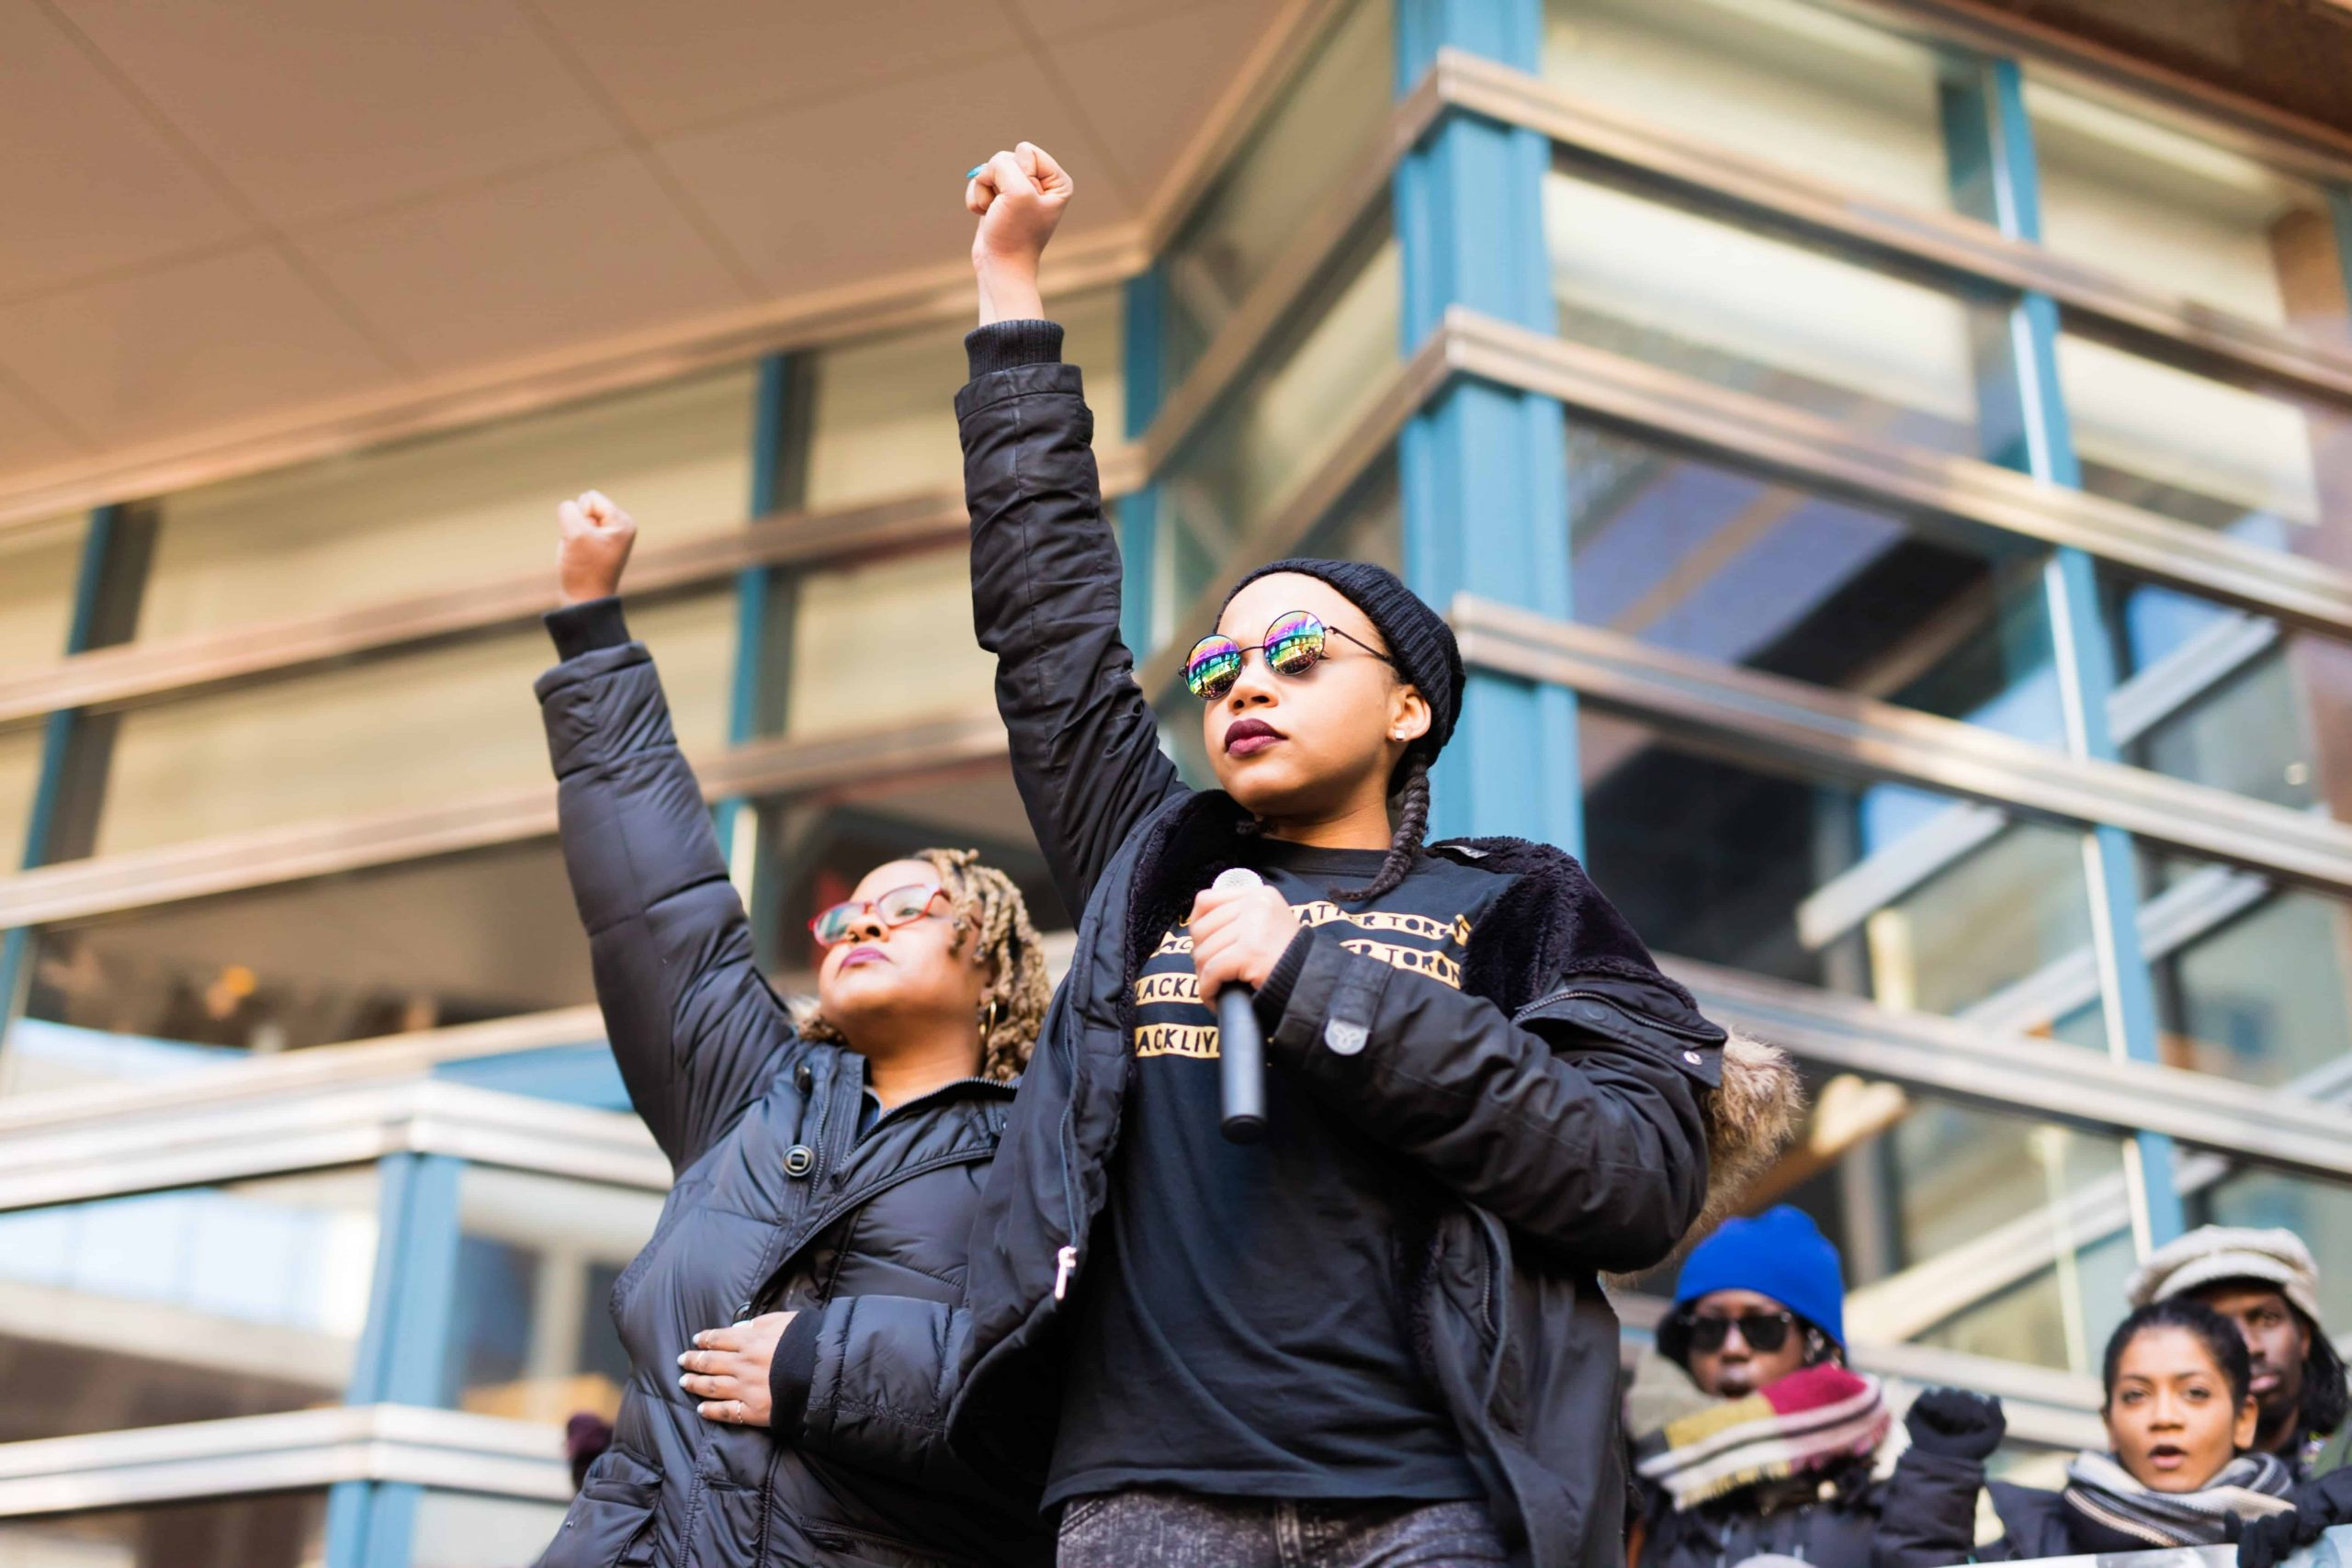 Blackness Under Scrutiny | The Varsity regarding University Of Toronto Calendar